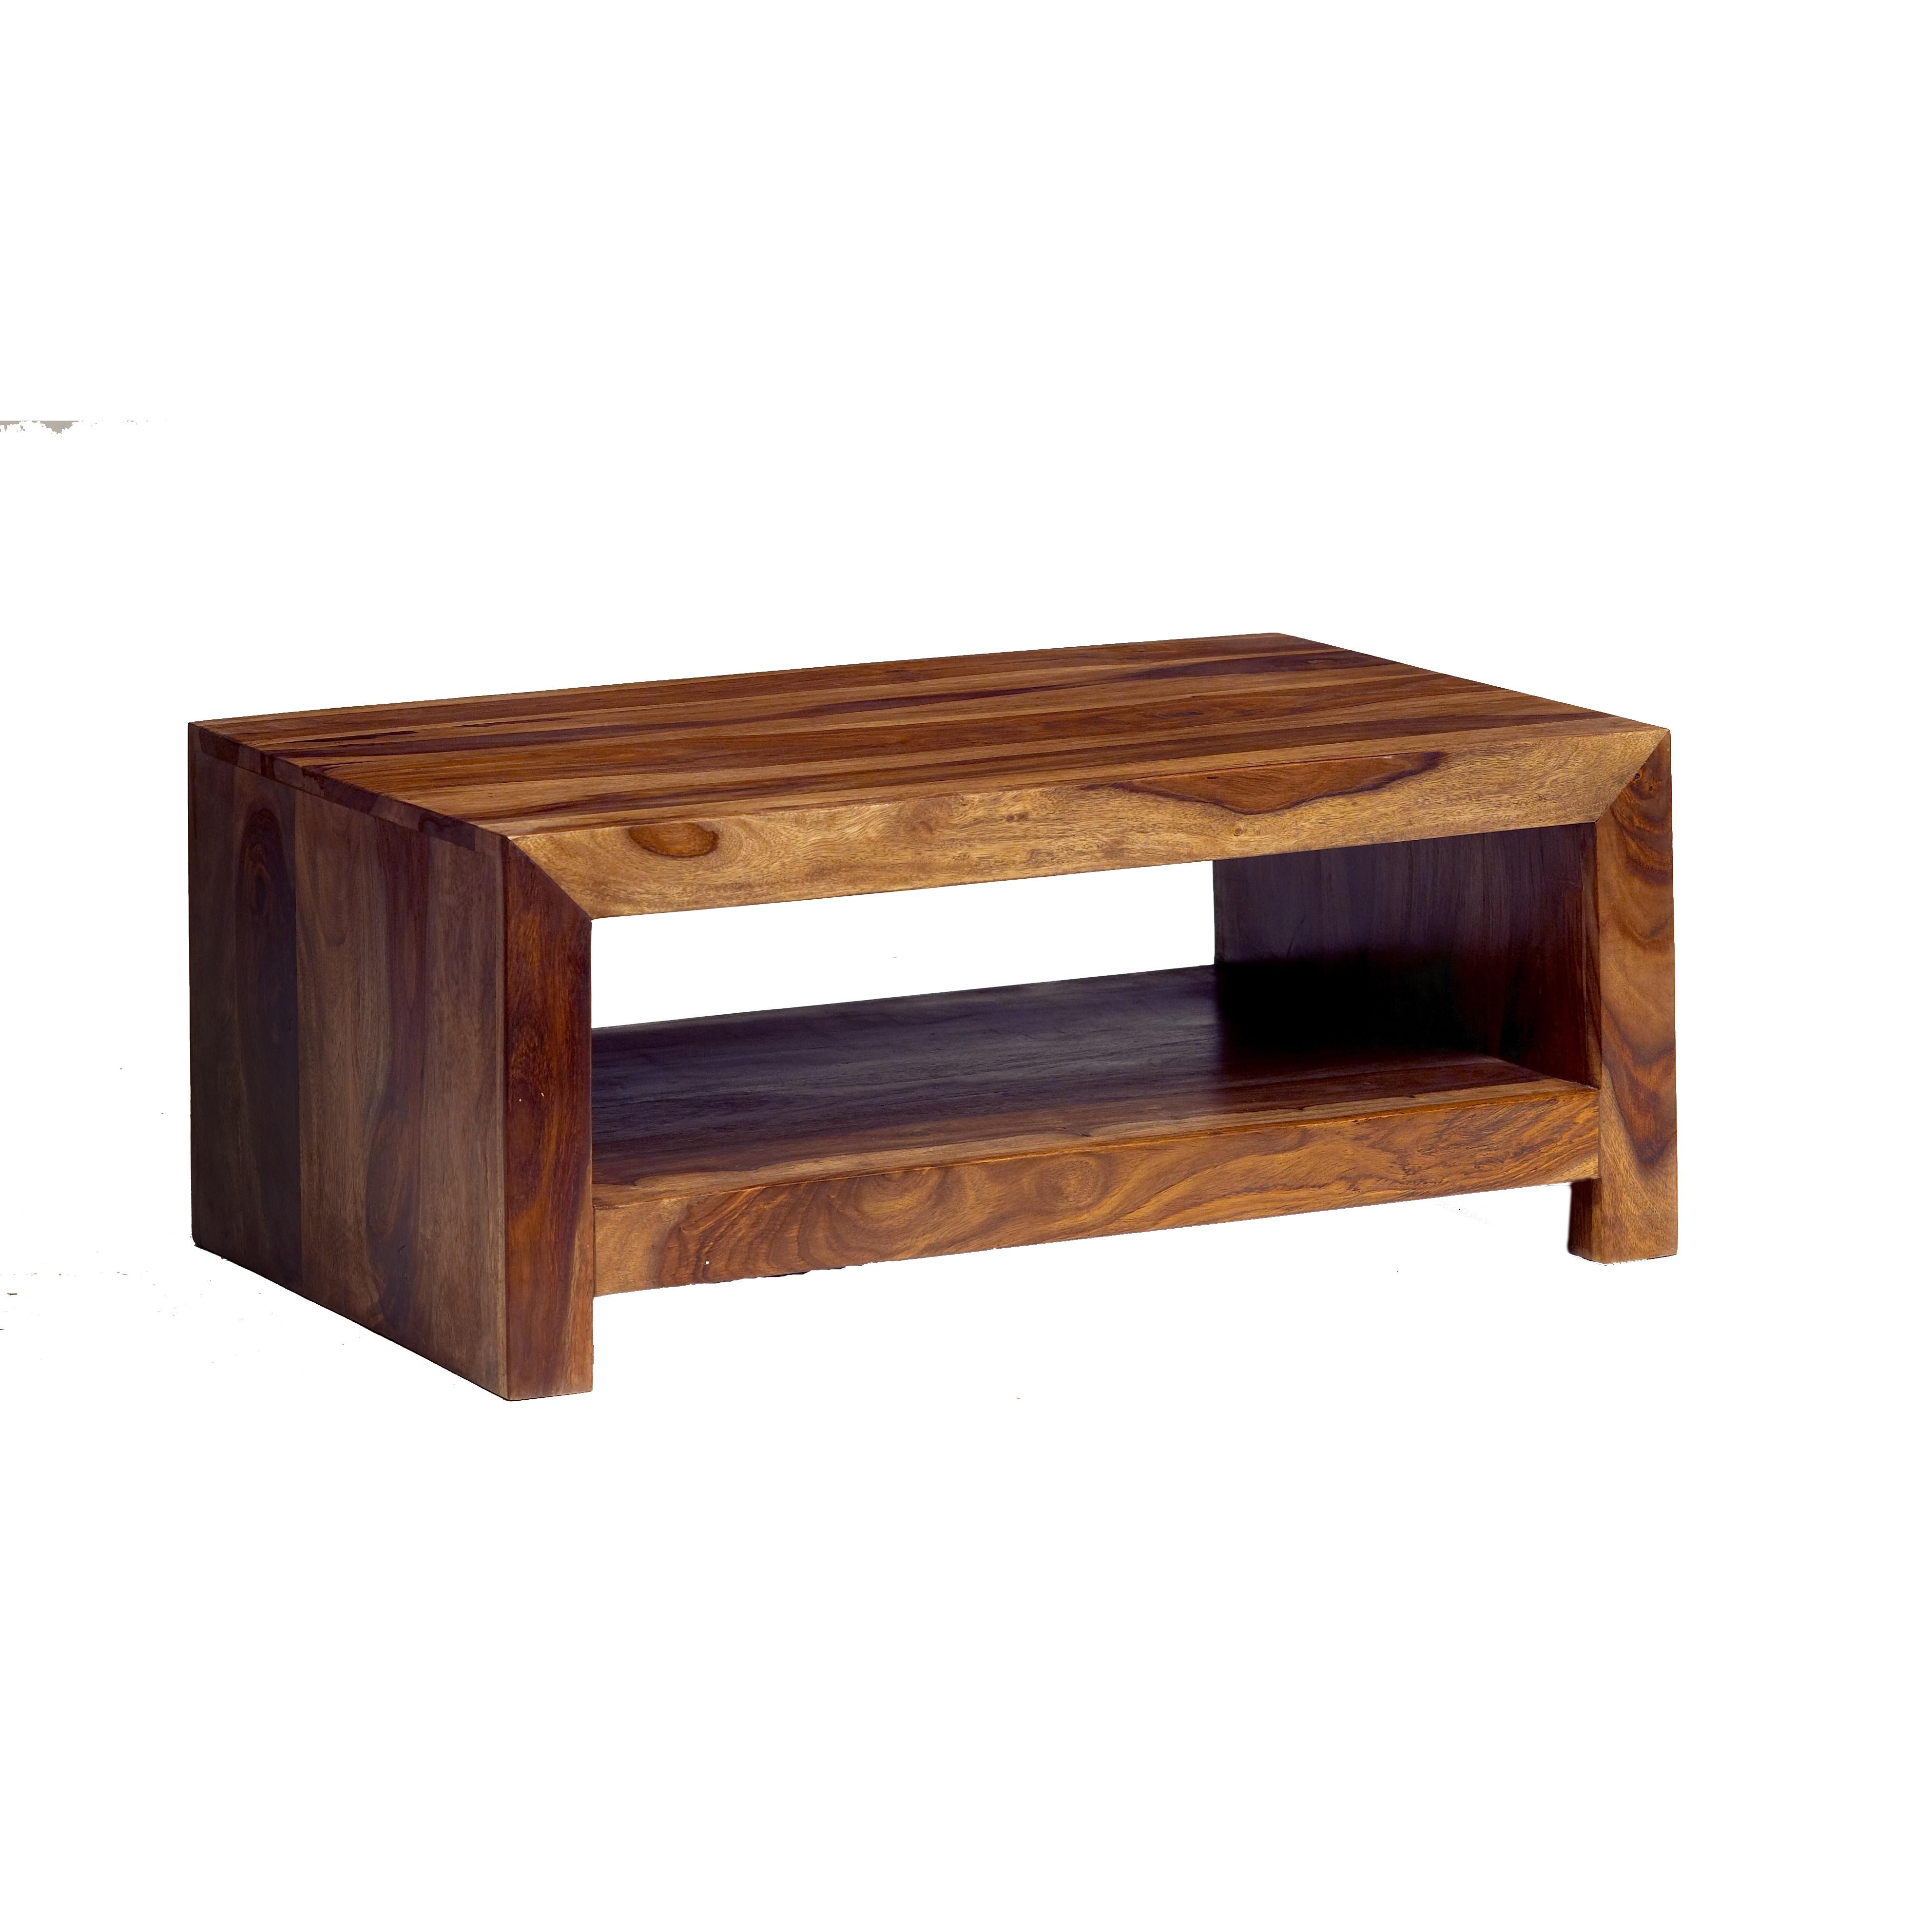 Cube Contemporary Coffee Table Medium